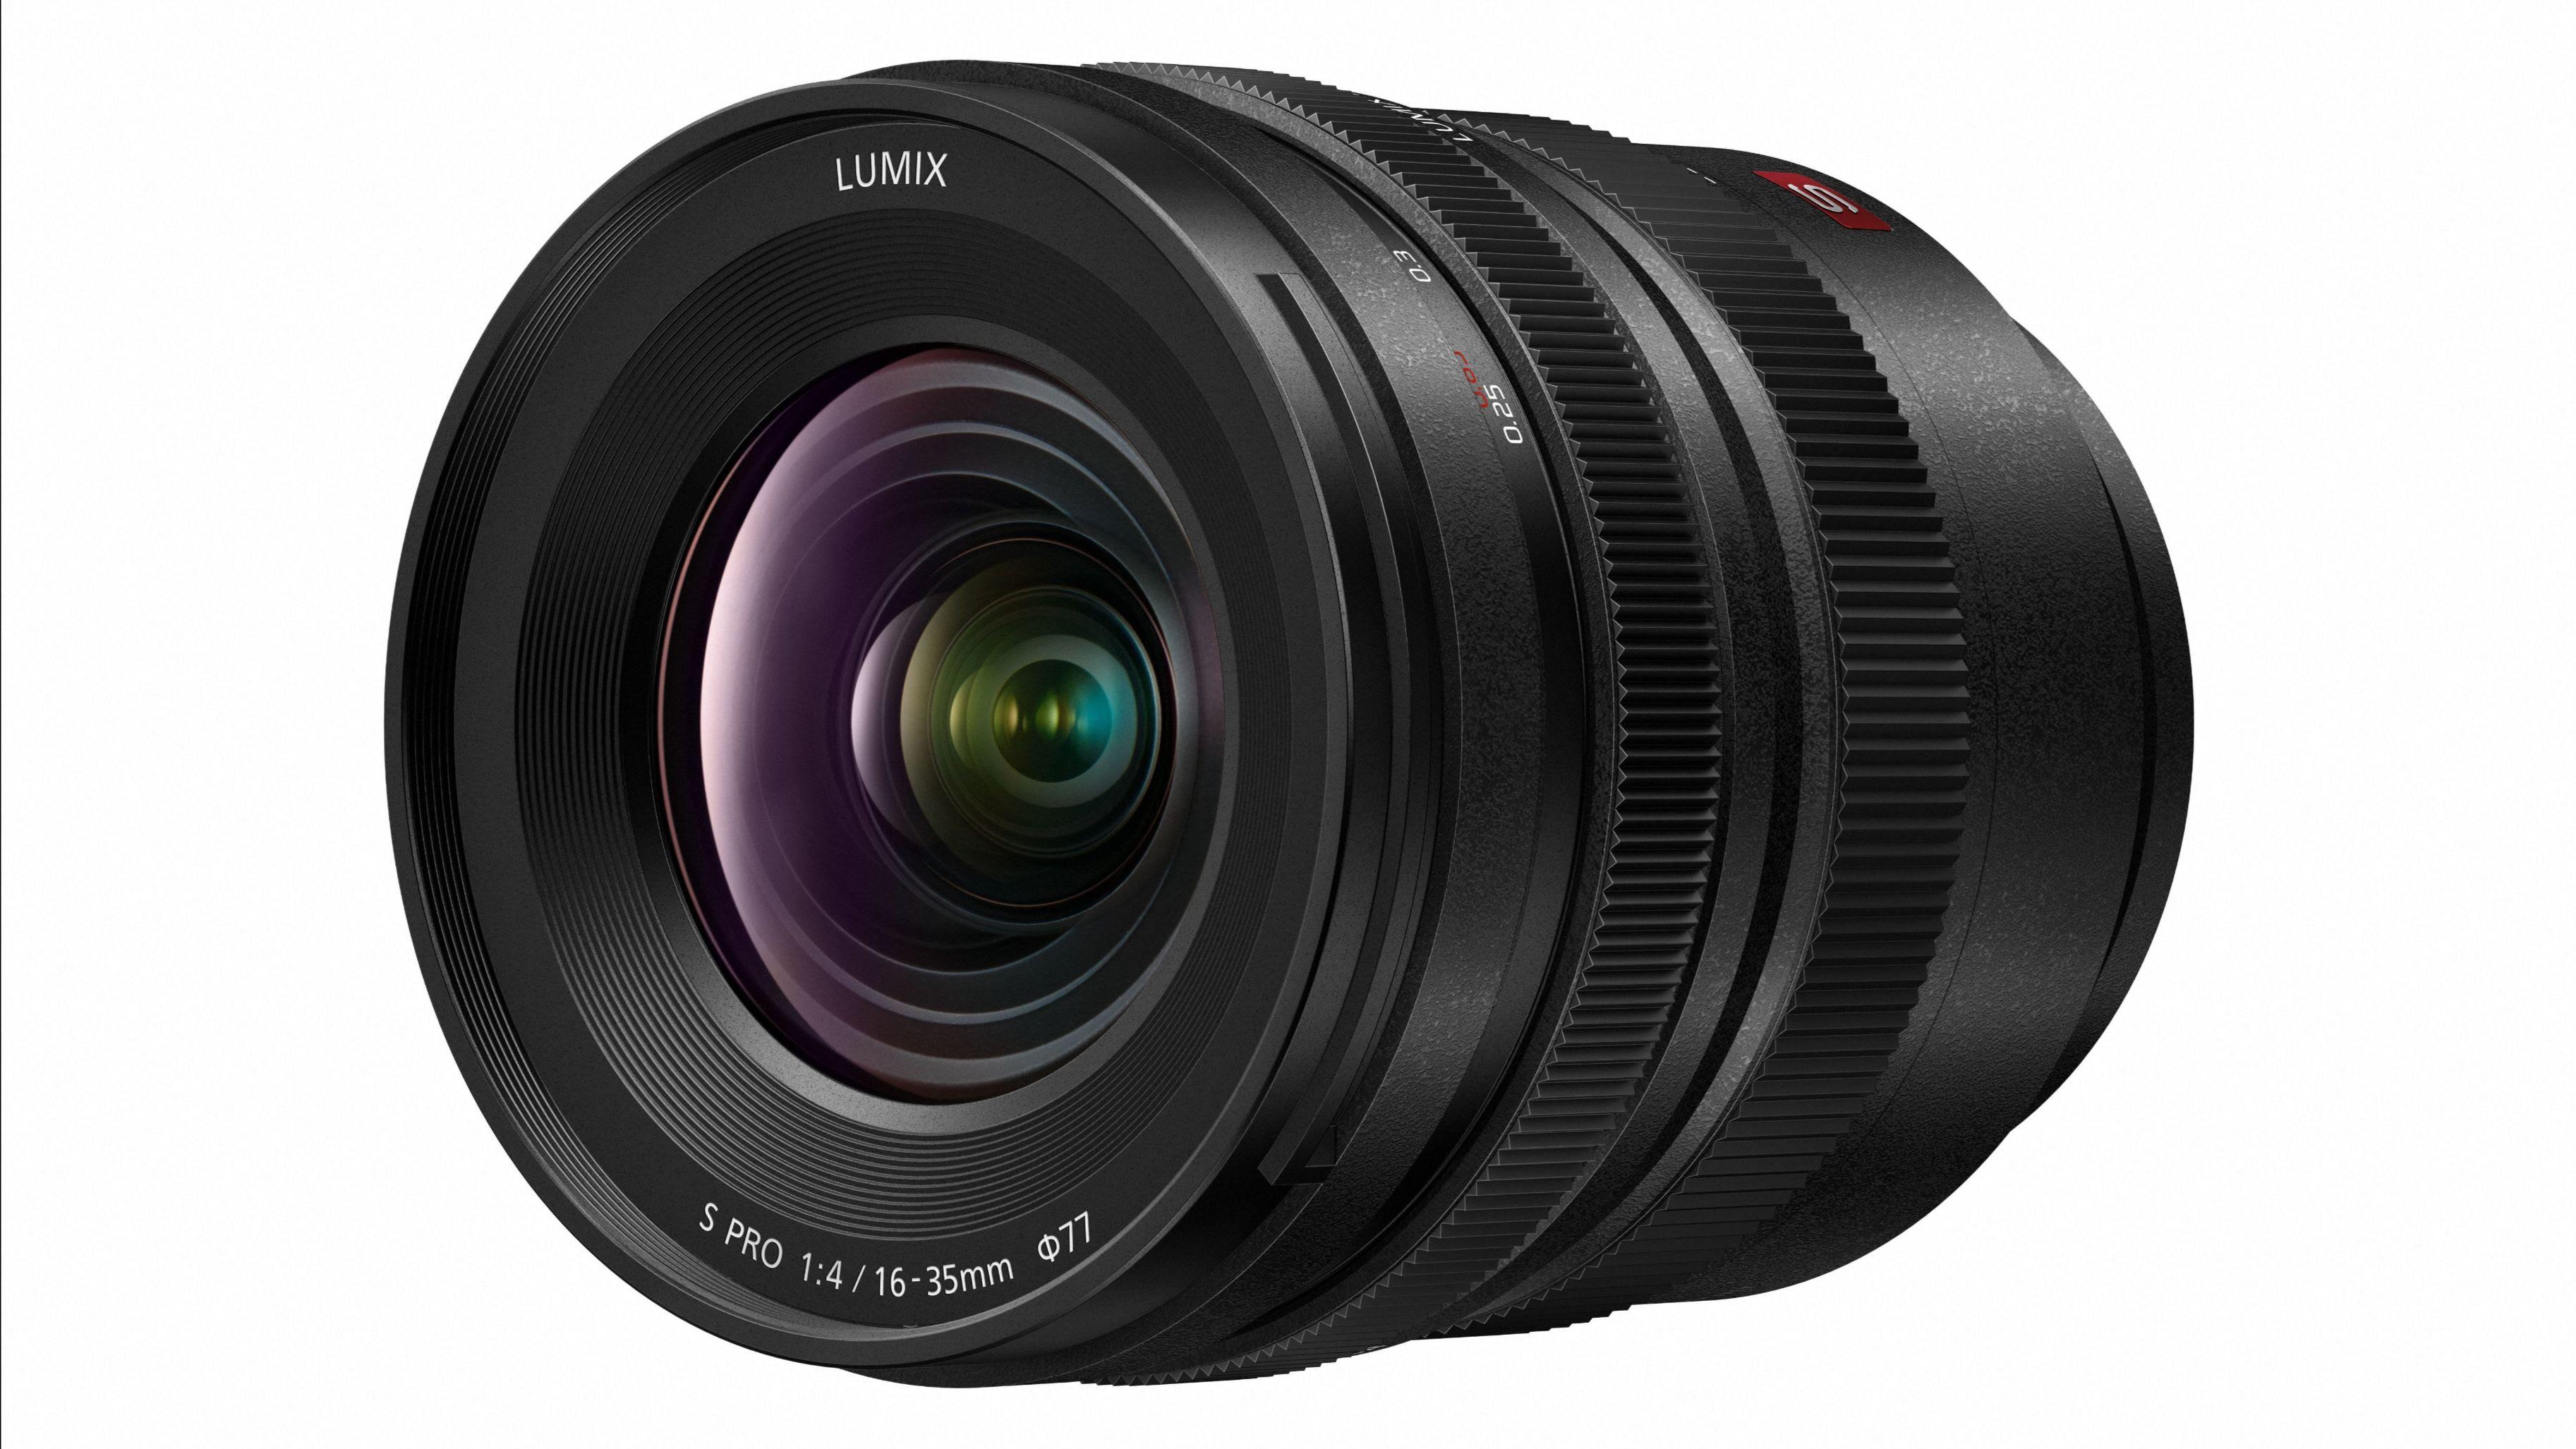 Nota de Prensa - Panasonic lanza dos nuevos objetivos intercambiables L-Mount para la serie LUMIX S Full-Frame sin espejo